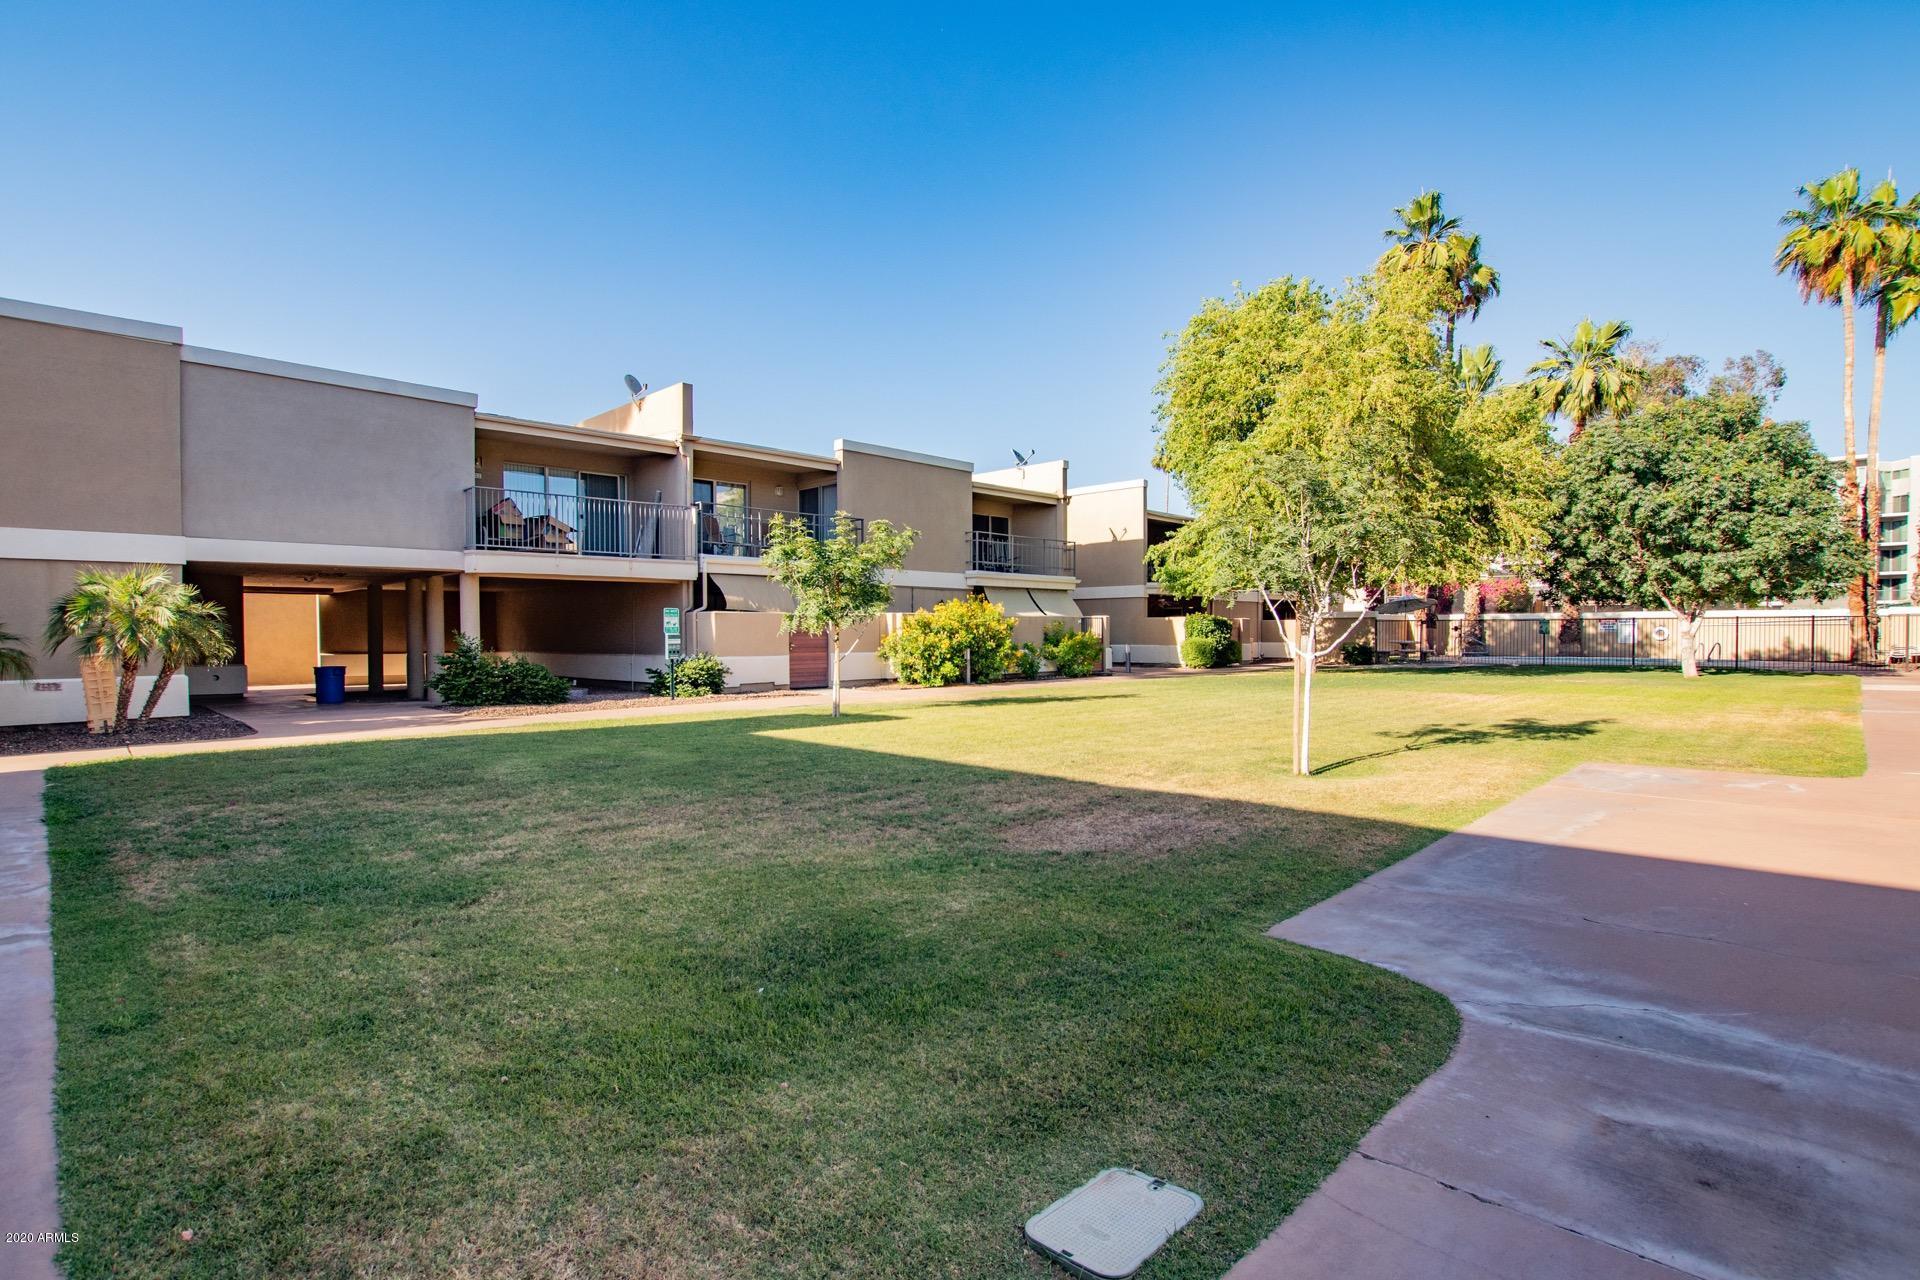 Photo of 2233 E Highland Avenue #127, Phoenix, AZ 85016